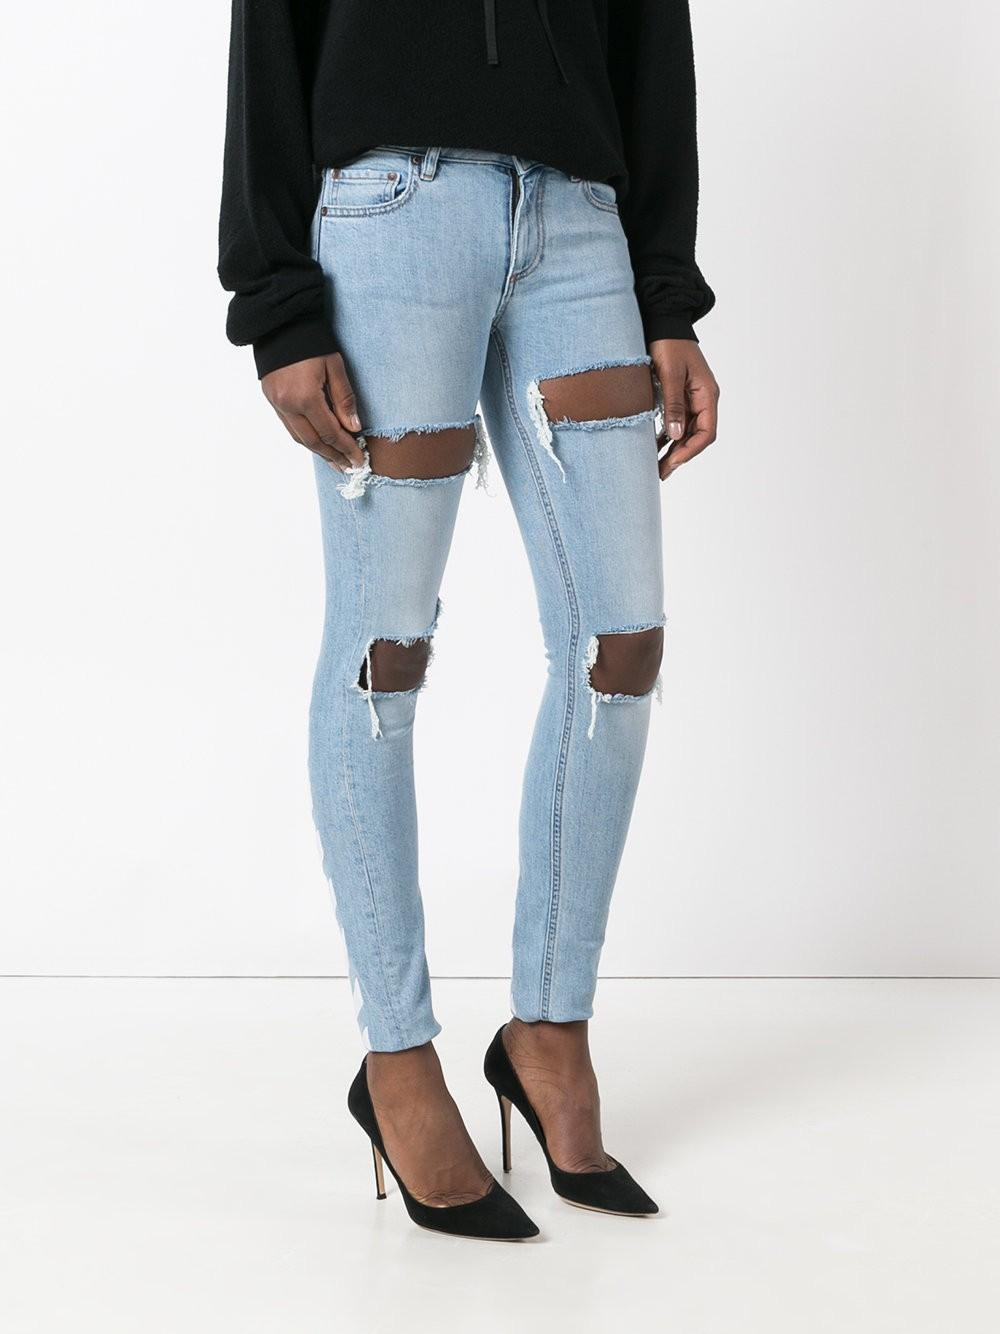 Off-White c/o Virgil Abloh Denim Ripped Drawstring Skinny Jeans in Blue